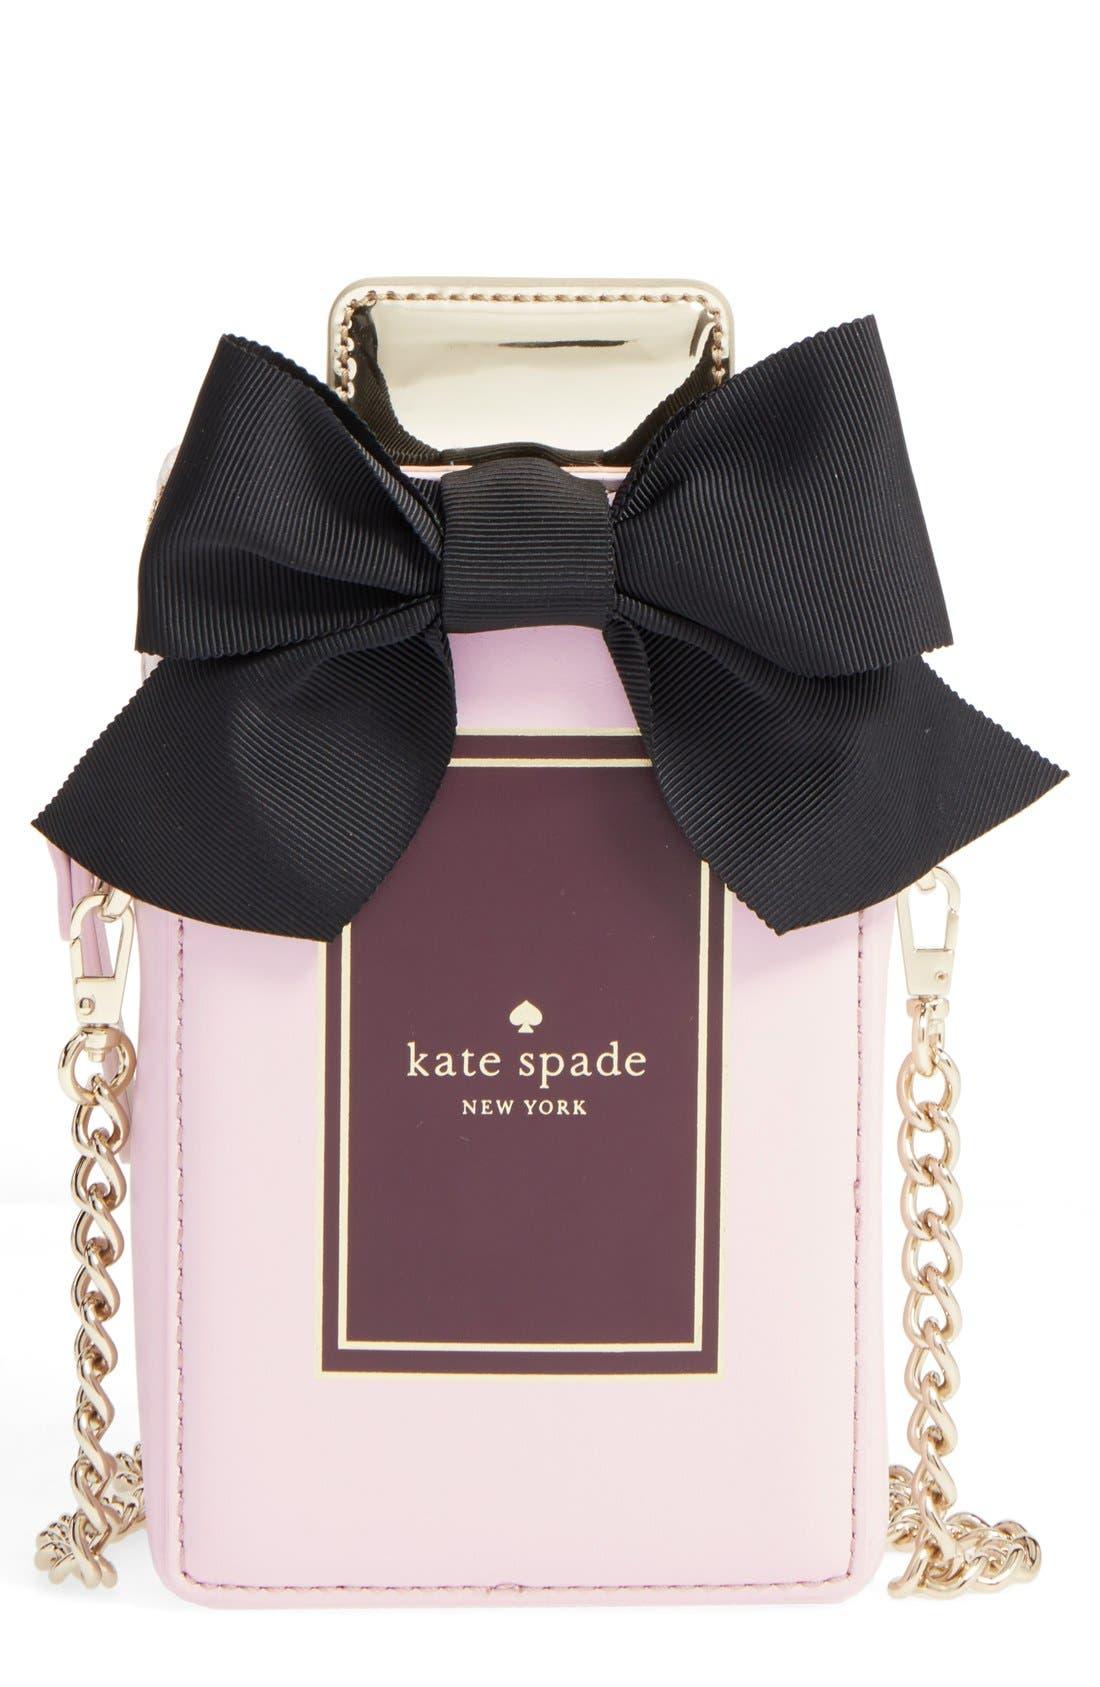 Main Image - kate spade new york 'on pointe - perfume bottle' leather crossbody bag